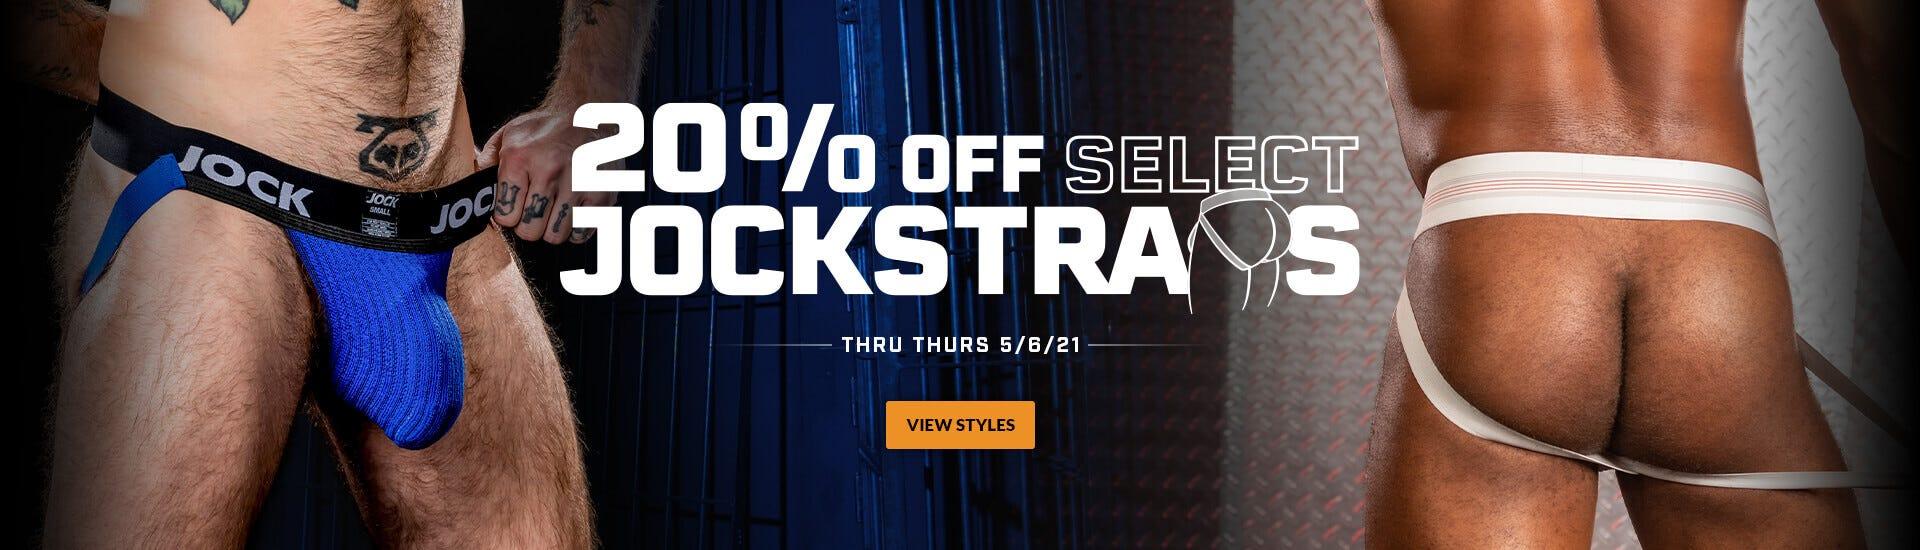 20% Off Select Jockstraps